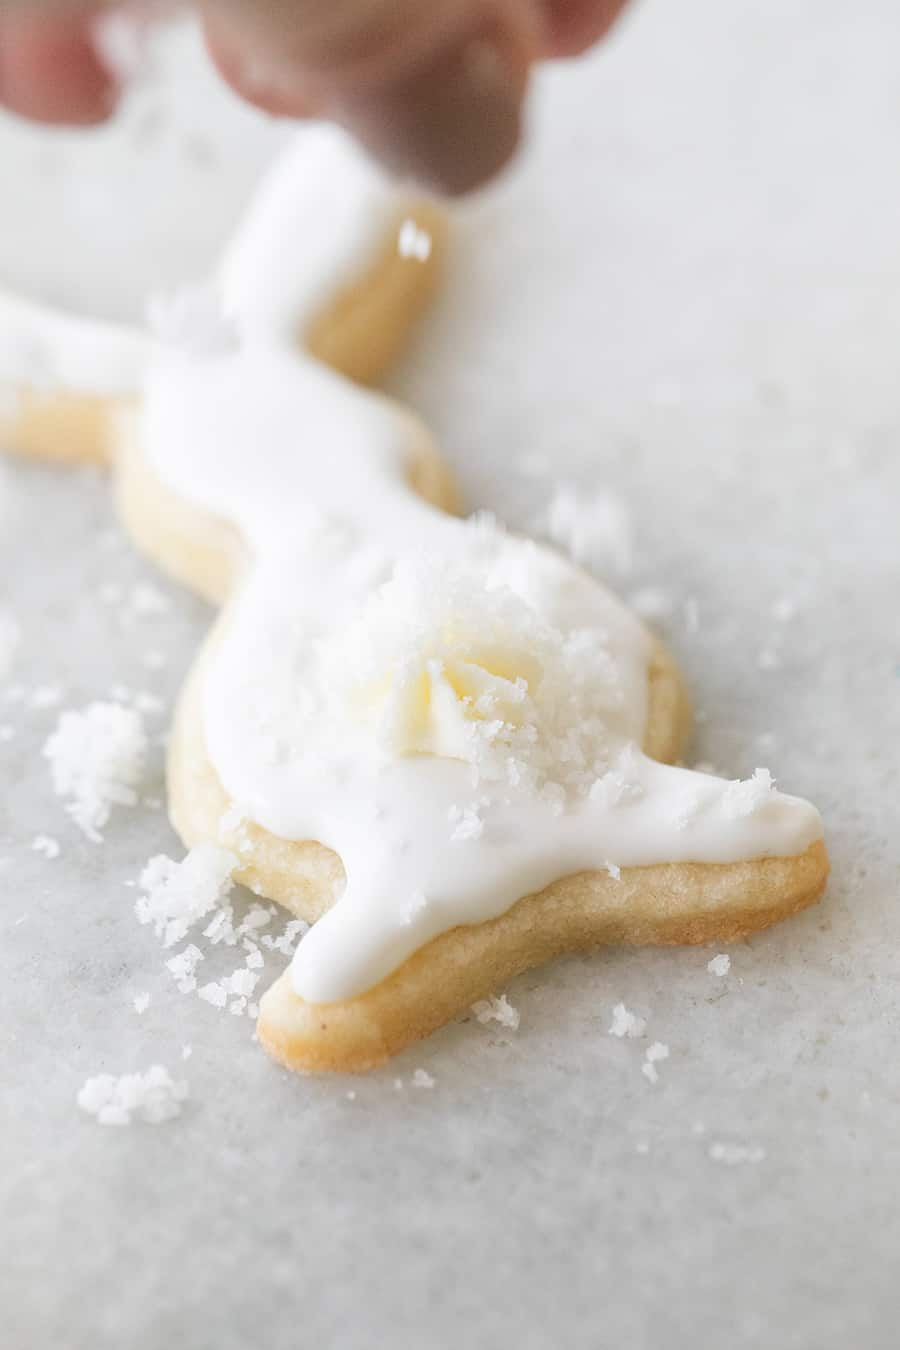 Sprinkling coconut onto an Easter cookie shaped like a bunny.